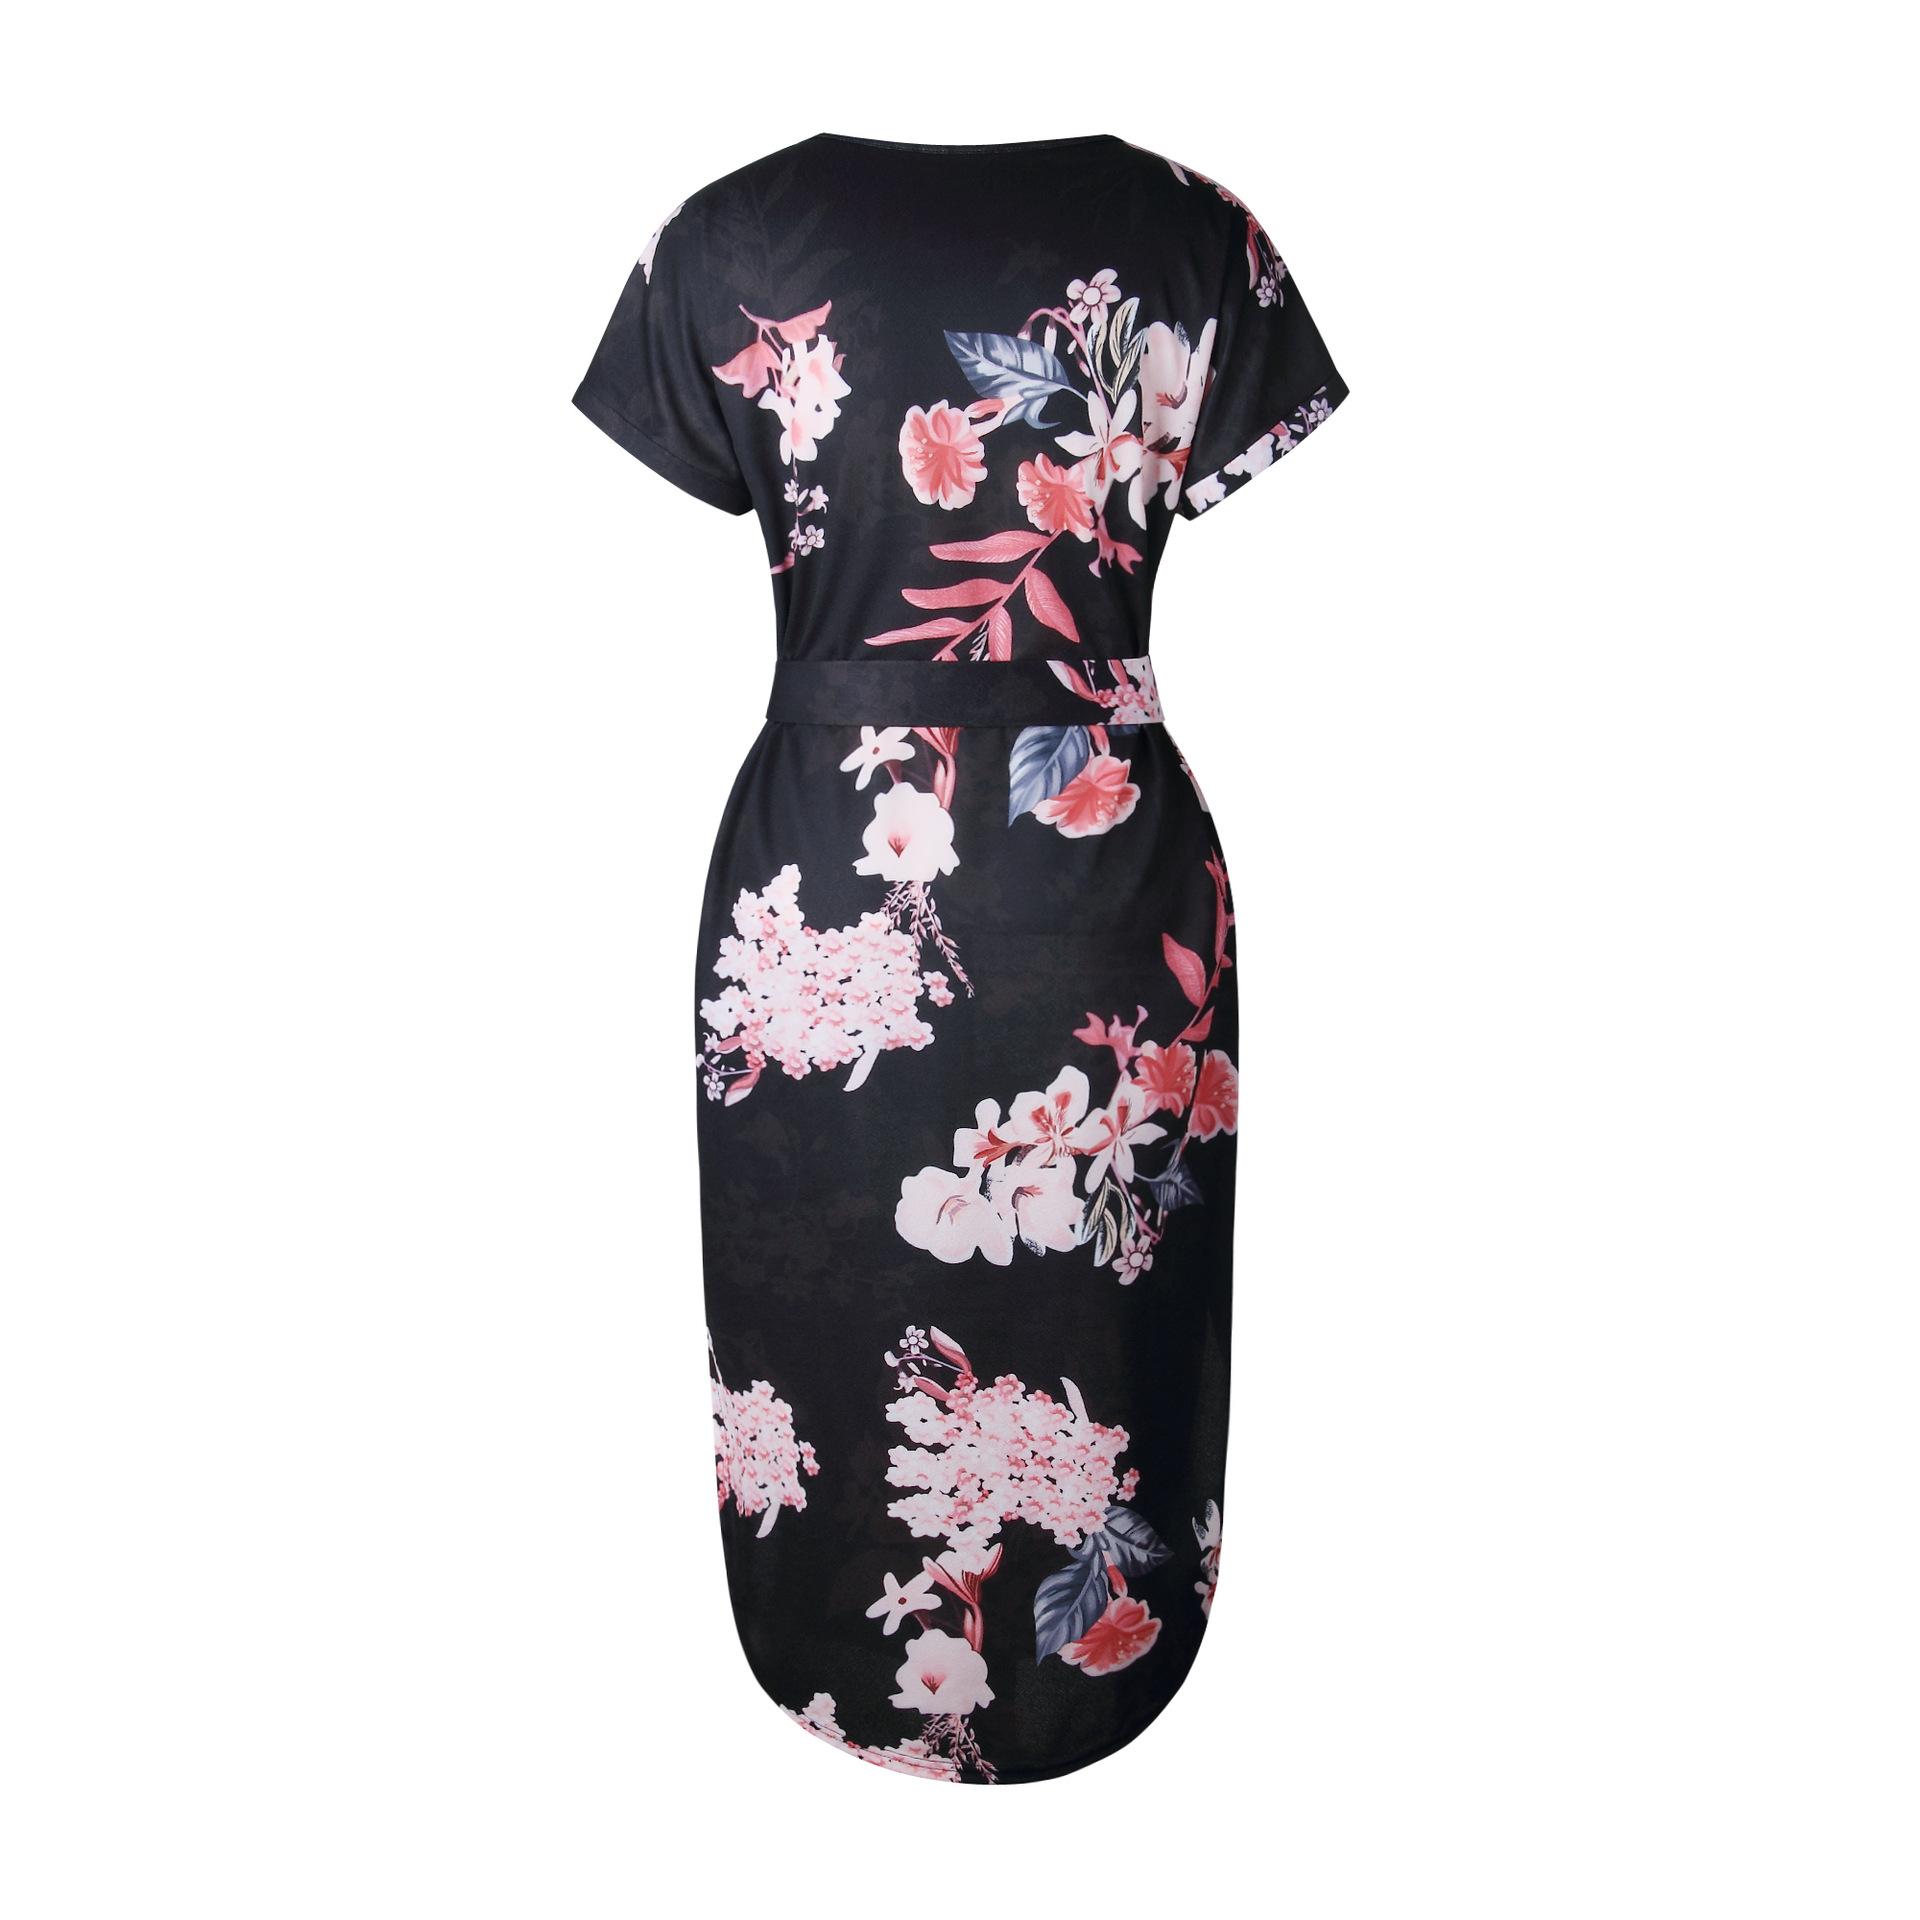 2018 Summer Dress Women Print V Neck Short Sleeve Robe Female Dresses Casual Sashes Midi Dress Ladies Elegant Vestidos Dropship 24